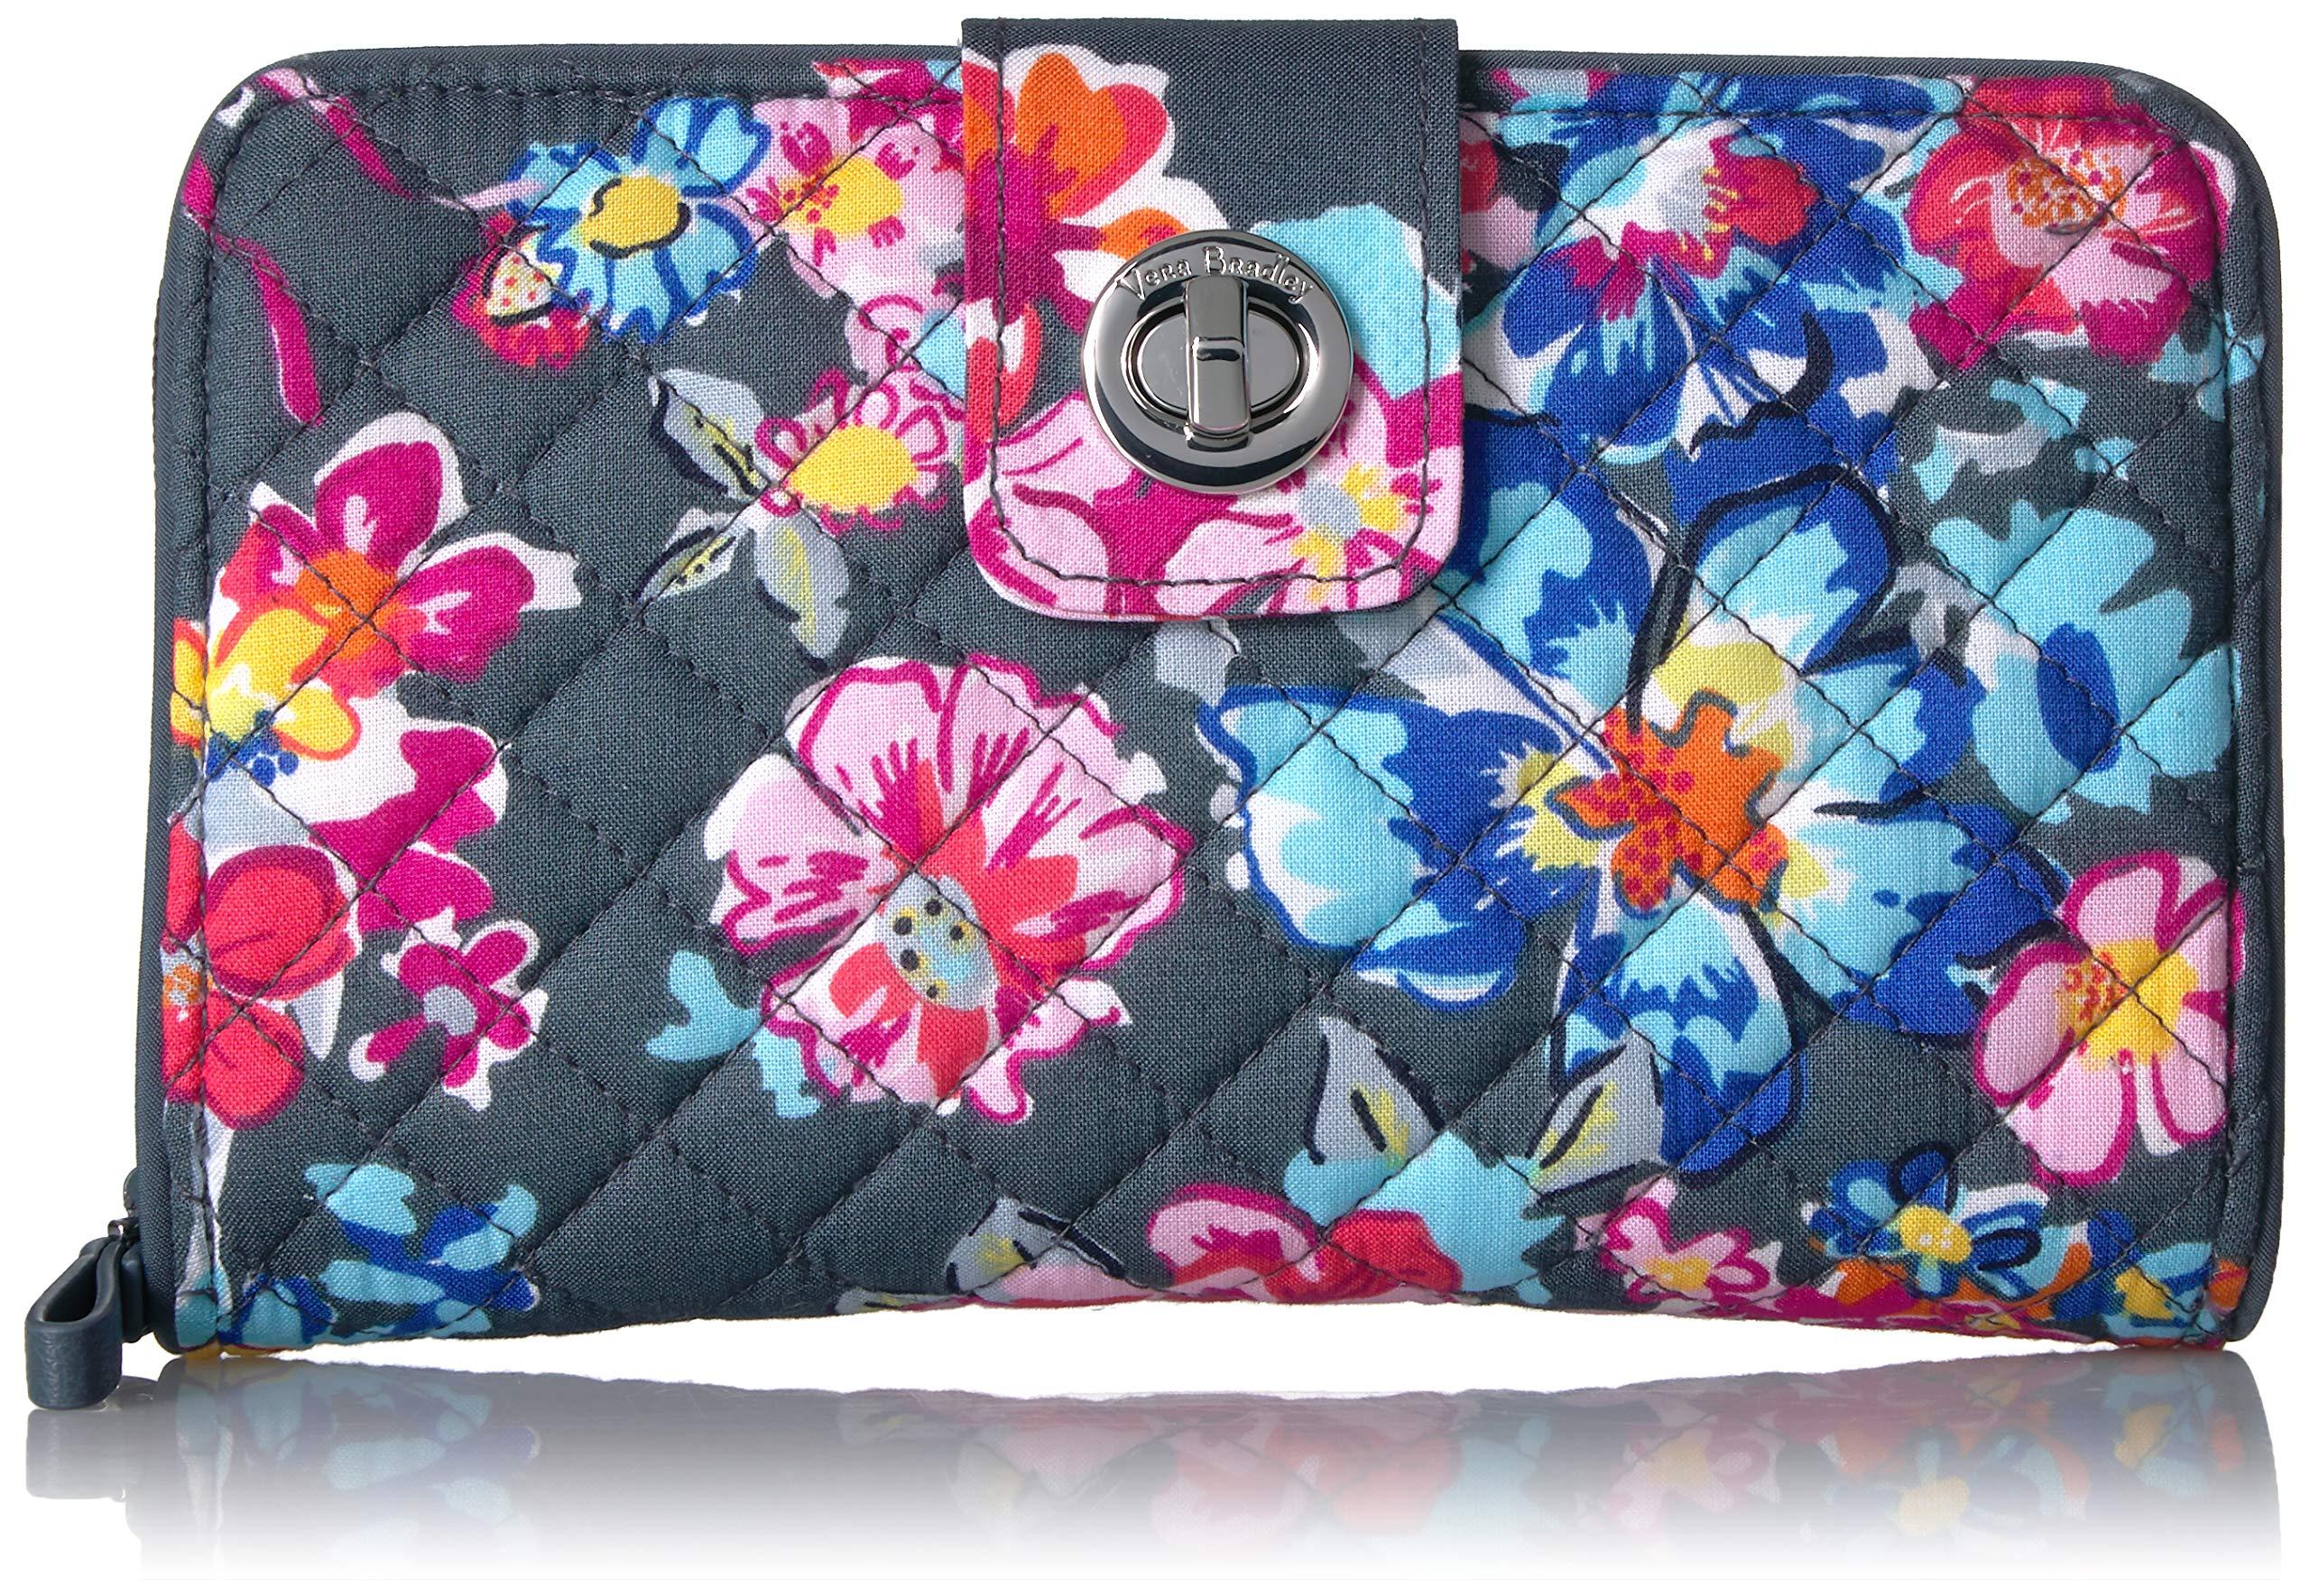 Vera Bradley Iconic RFID Turnlock Wallet, Signature Cotton, pretty Posies